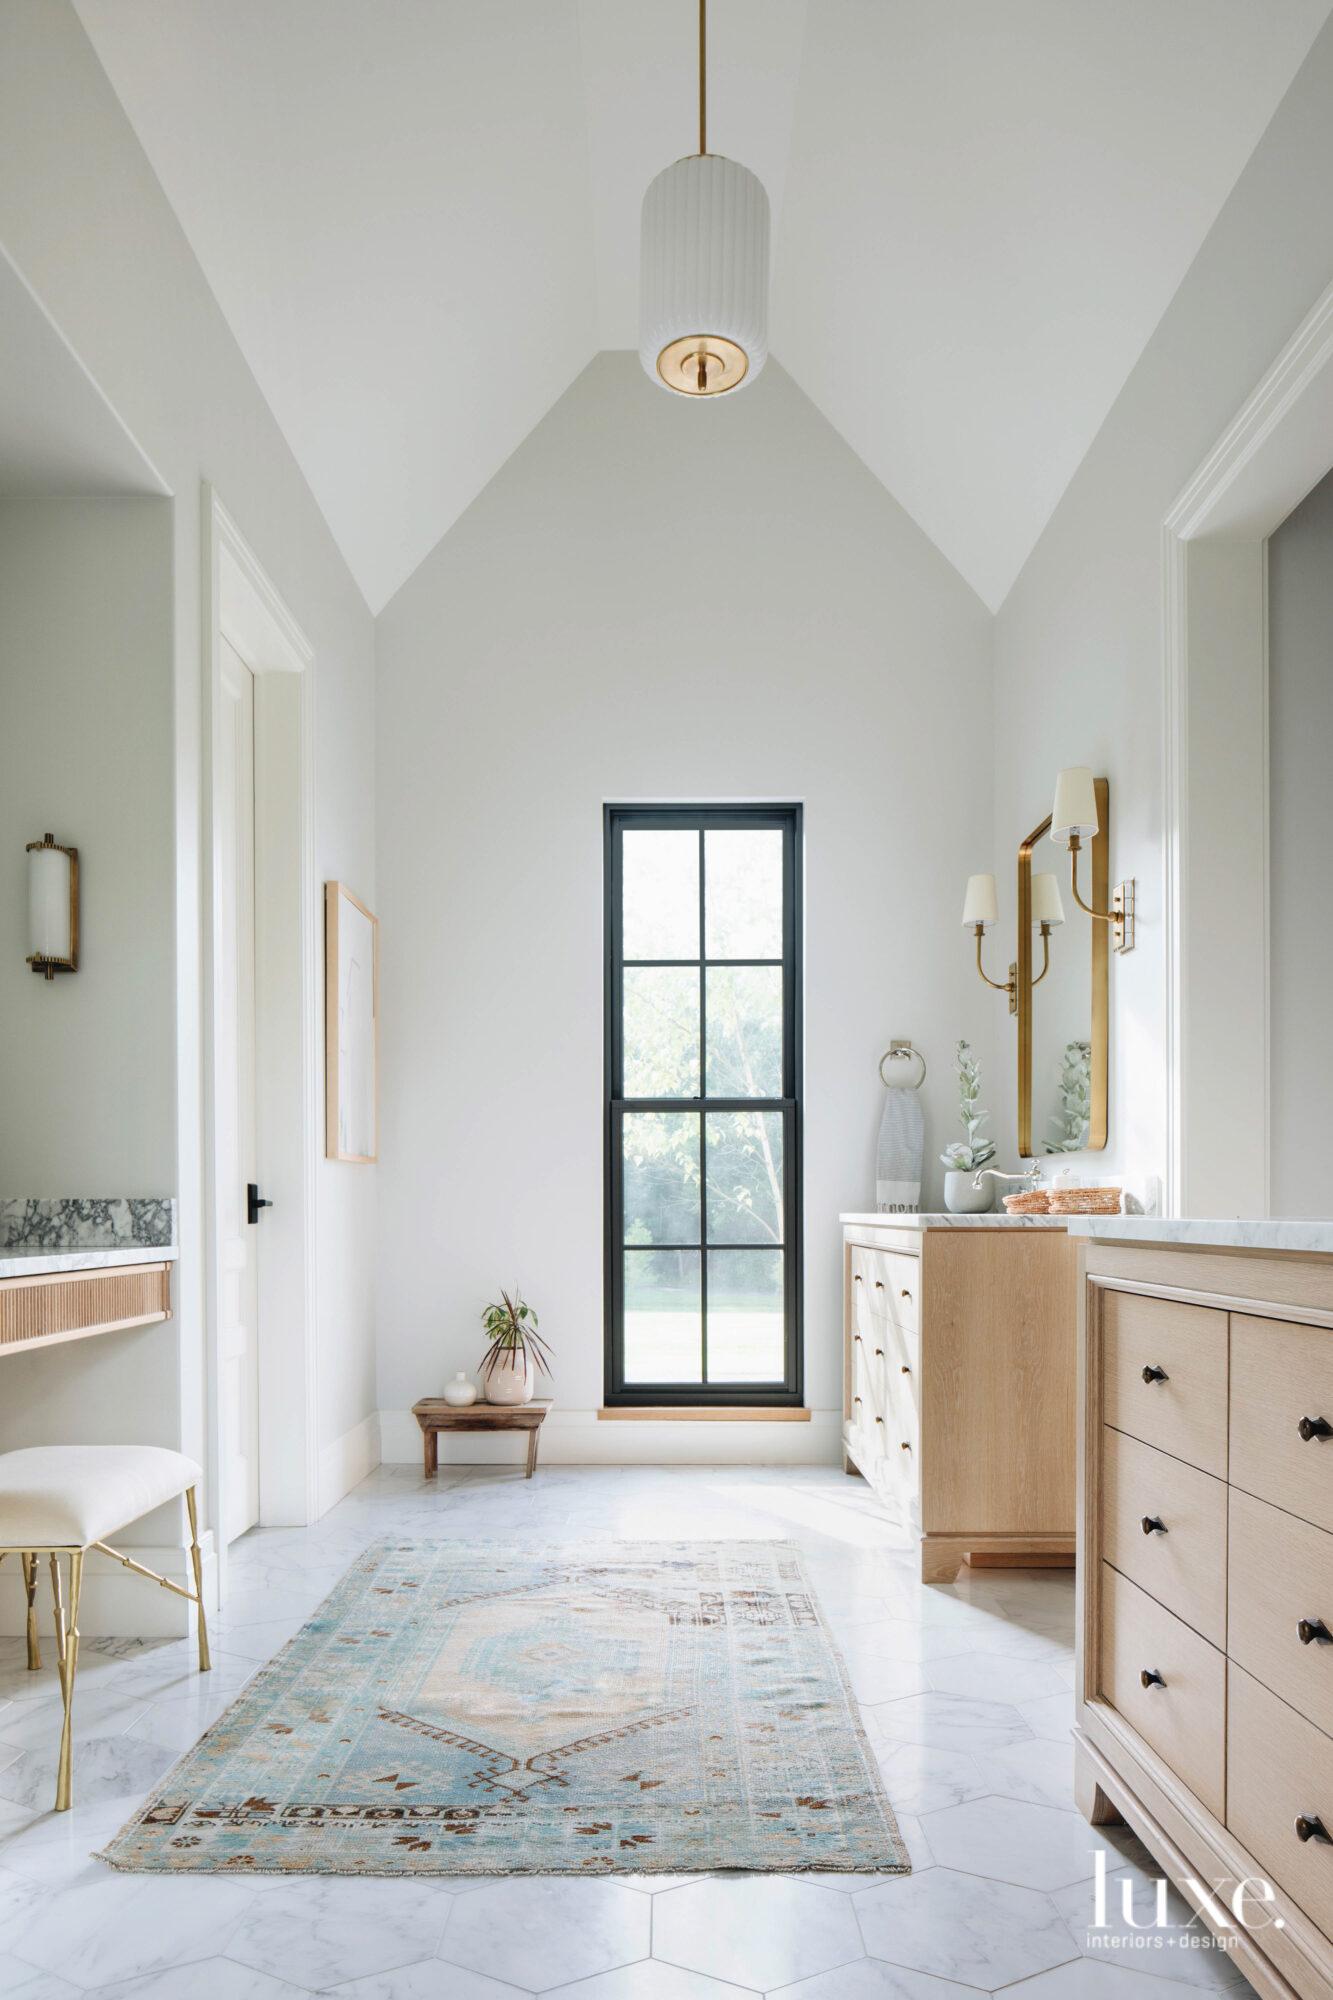 White oak vanities match perfectly...